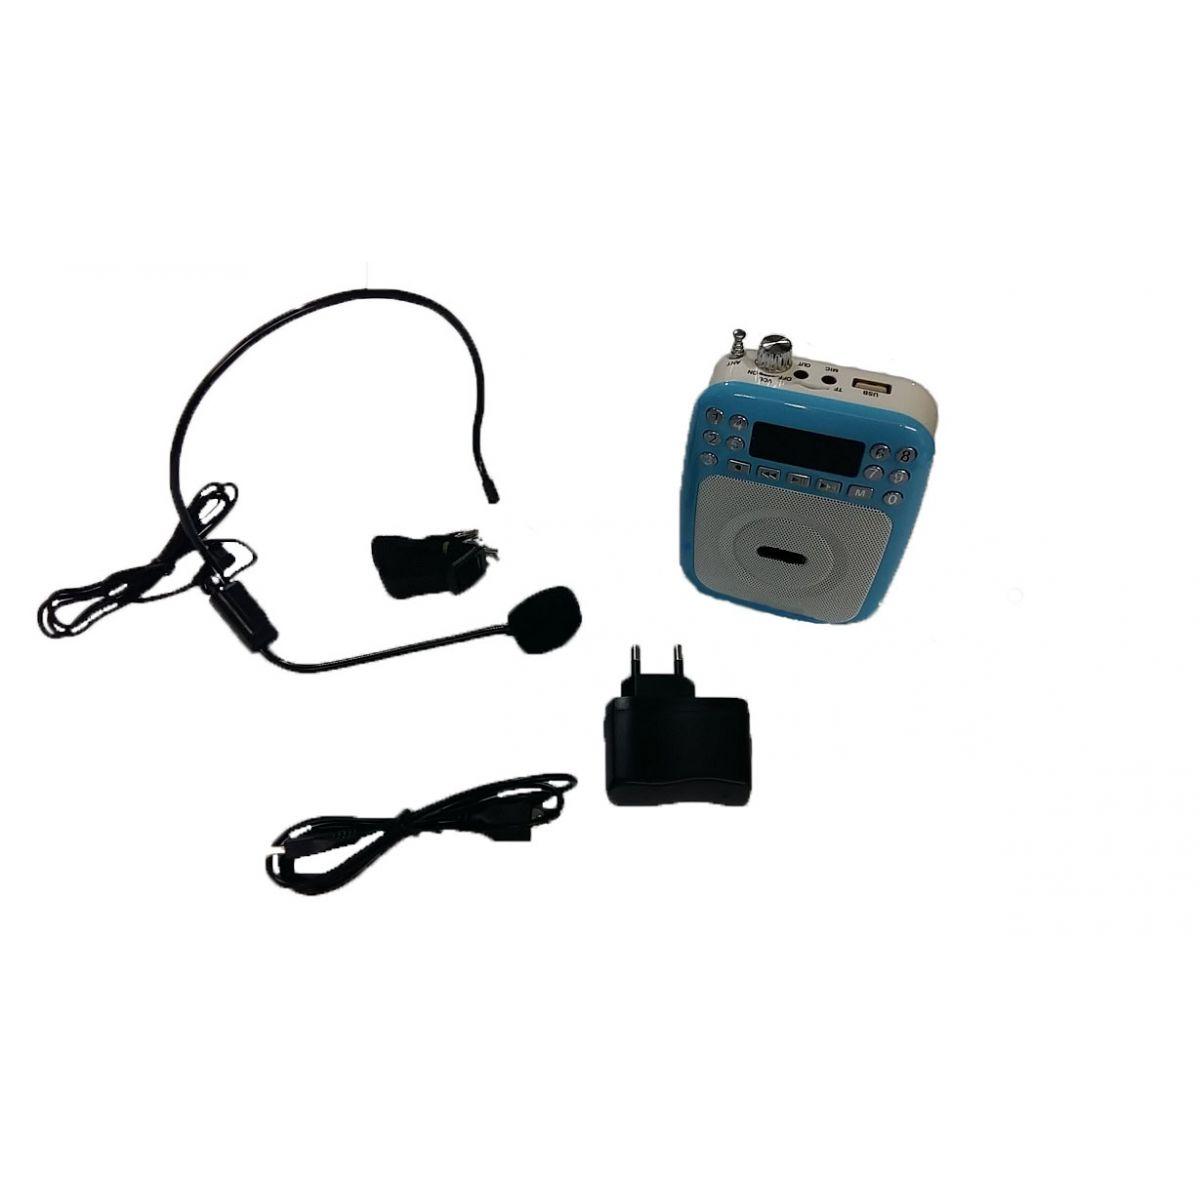 Kit Som Professor Zzhang XZ812 USB SDFM Bateria e Mic Grava